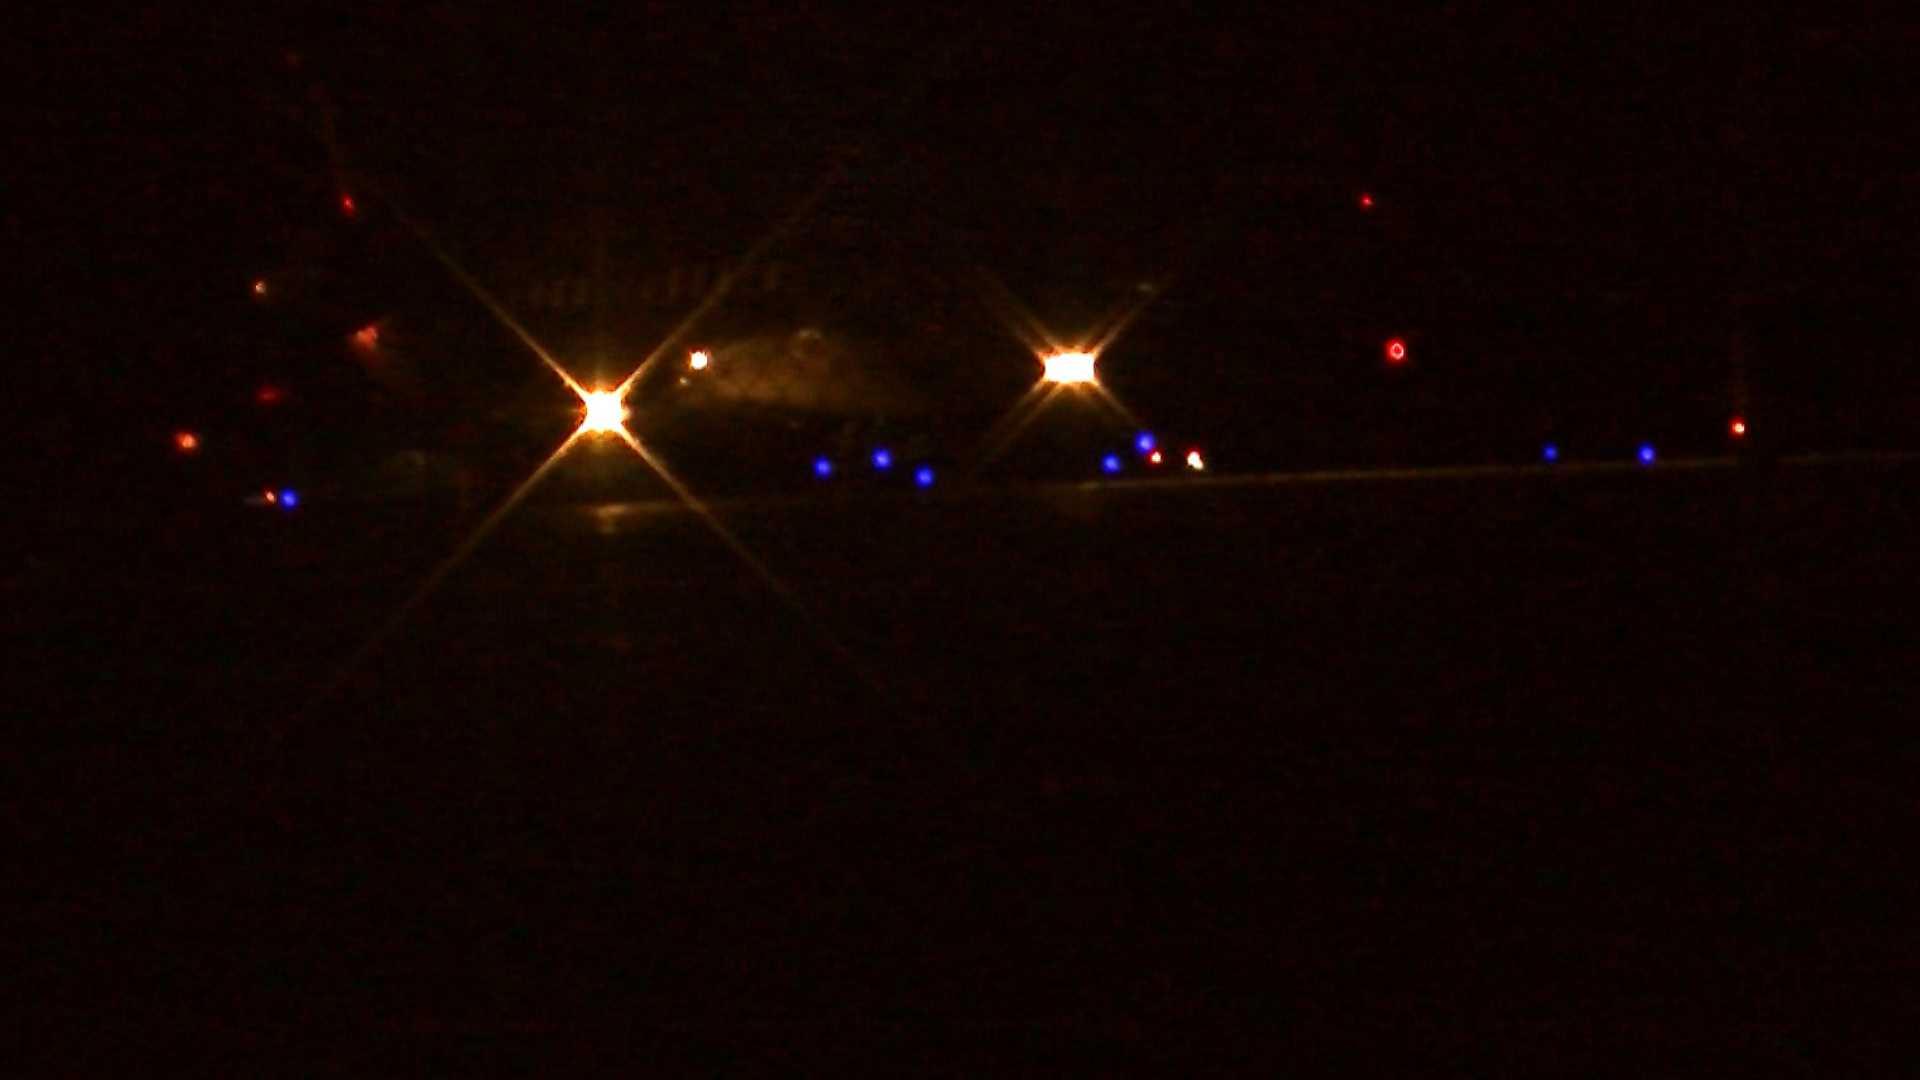 020613 Plane makes emergency landing at BTV - img